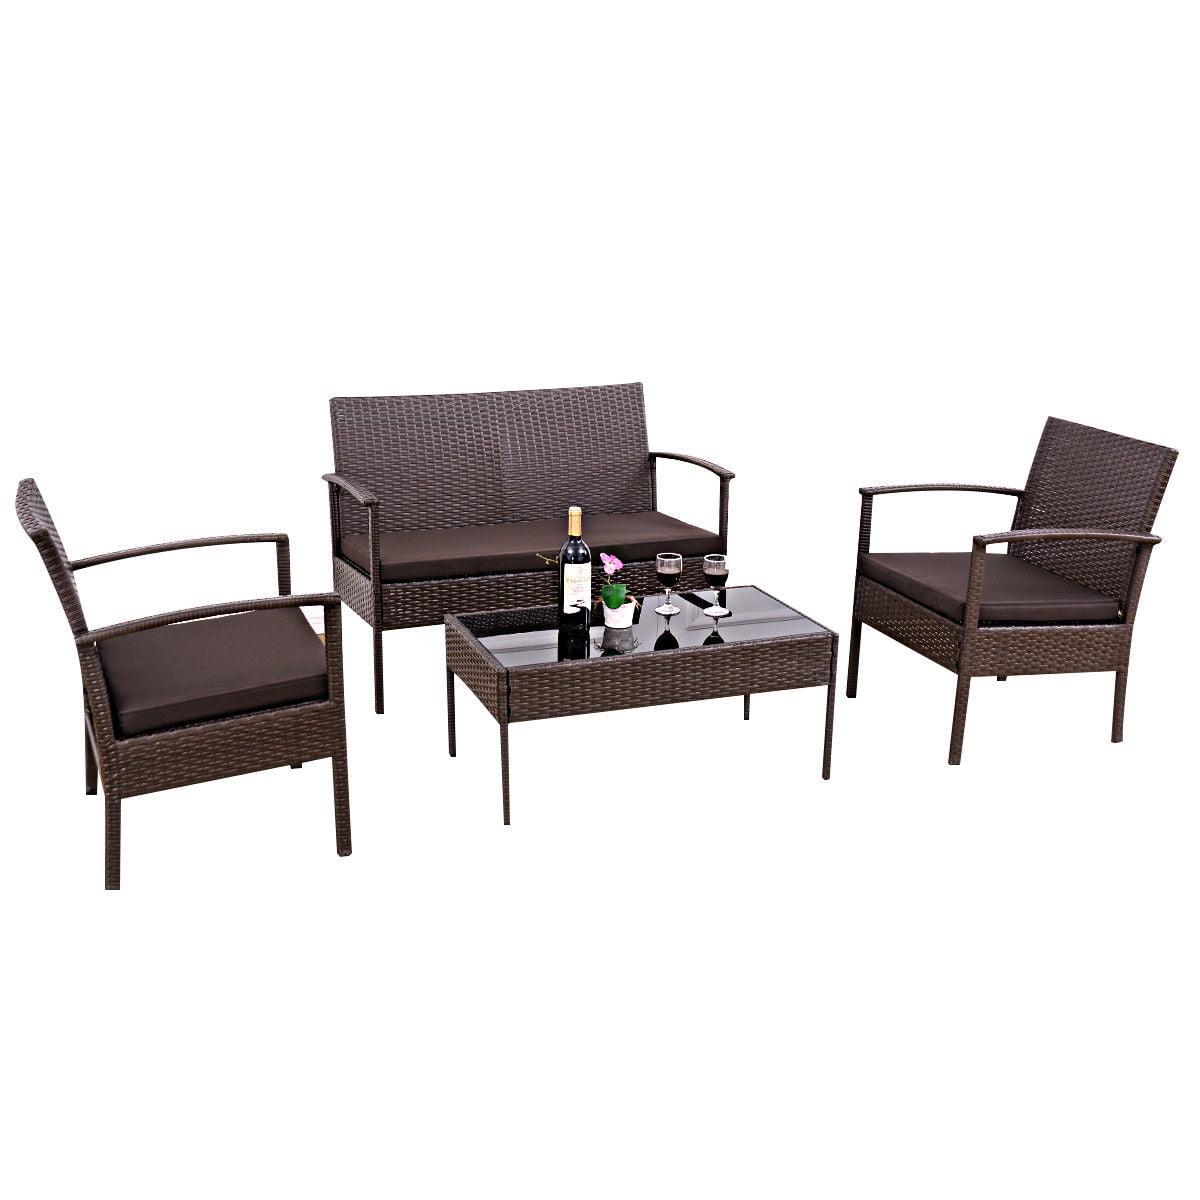 Gymax patio garden outdoor 4pc rattan wicker furniture set brown walmart com